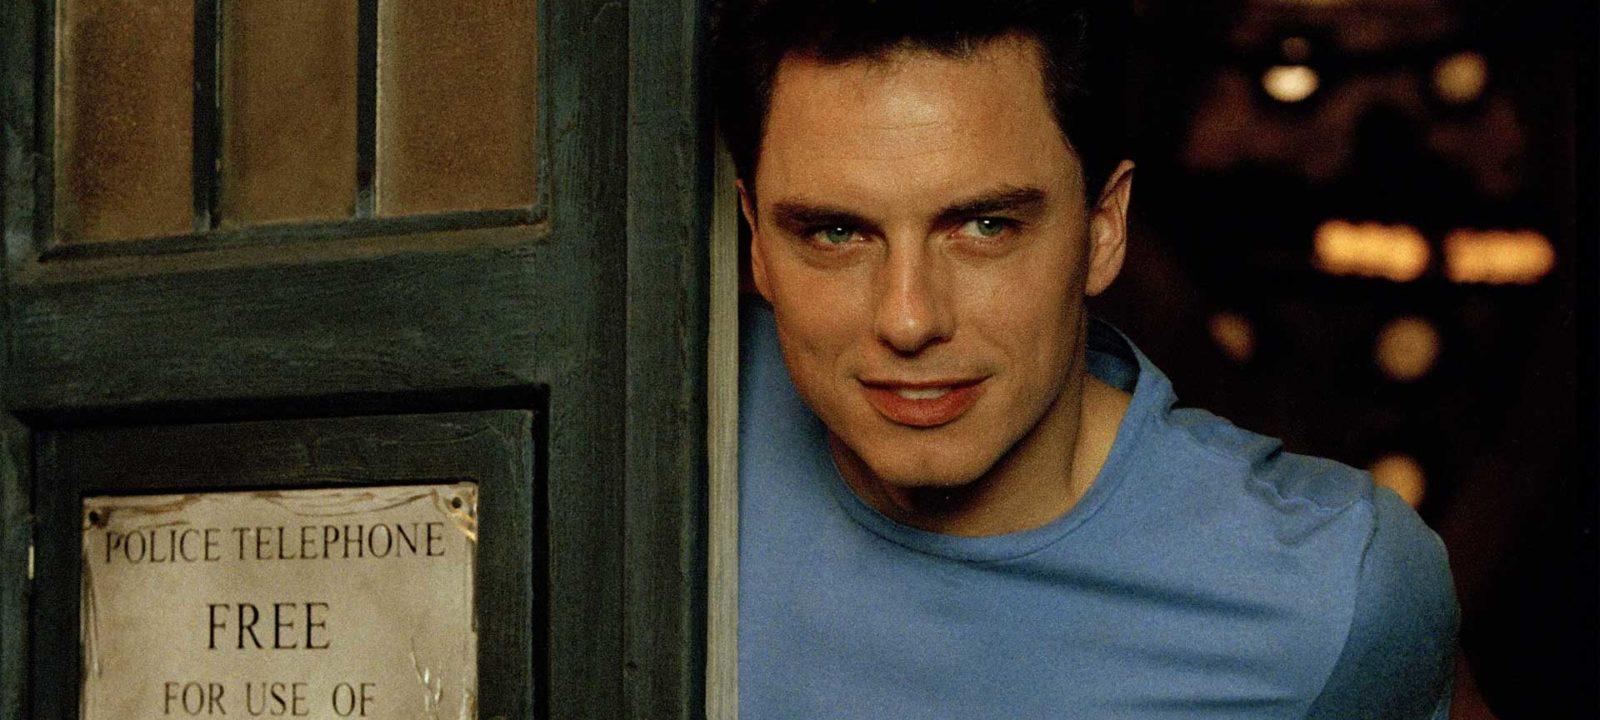 Captain Jack in the TARDIS (Photo: BBC)